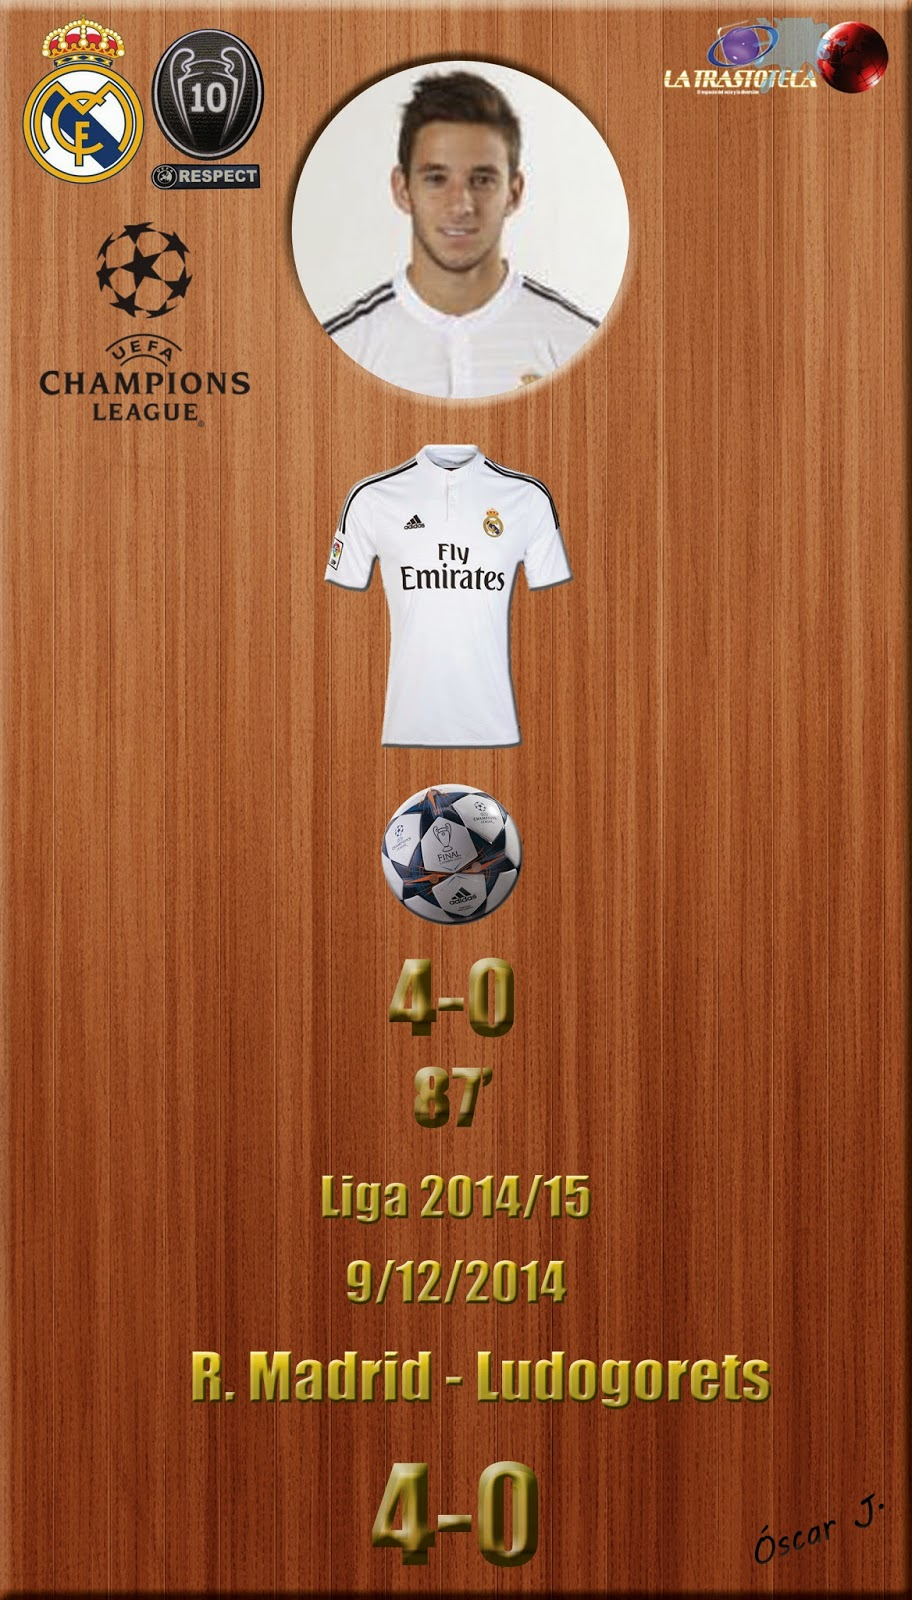 Medrán (4-0) - Real Madrid 4-0 Ludogorets - Champions League 2014/15 - Jornada 6 - (9/12/2014)